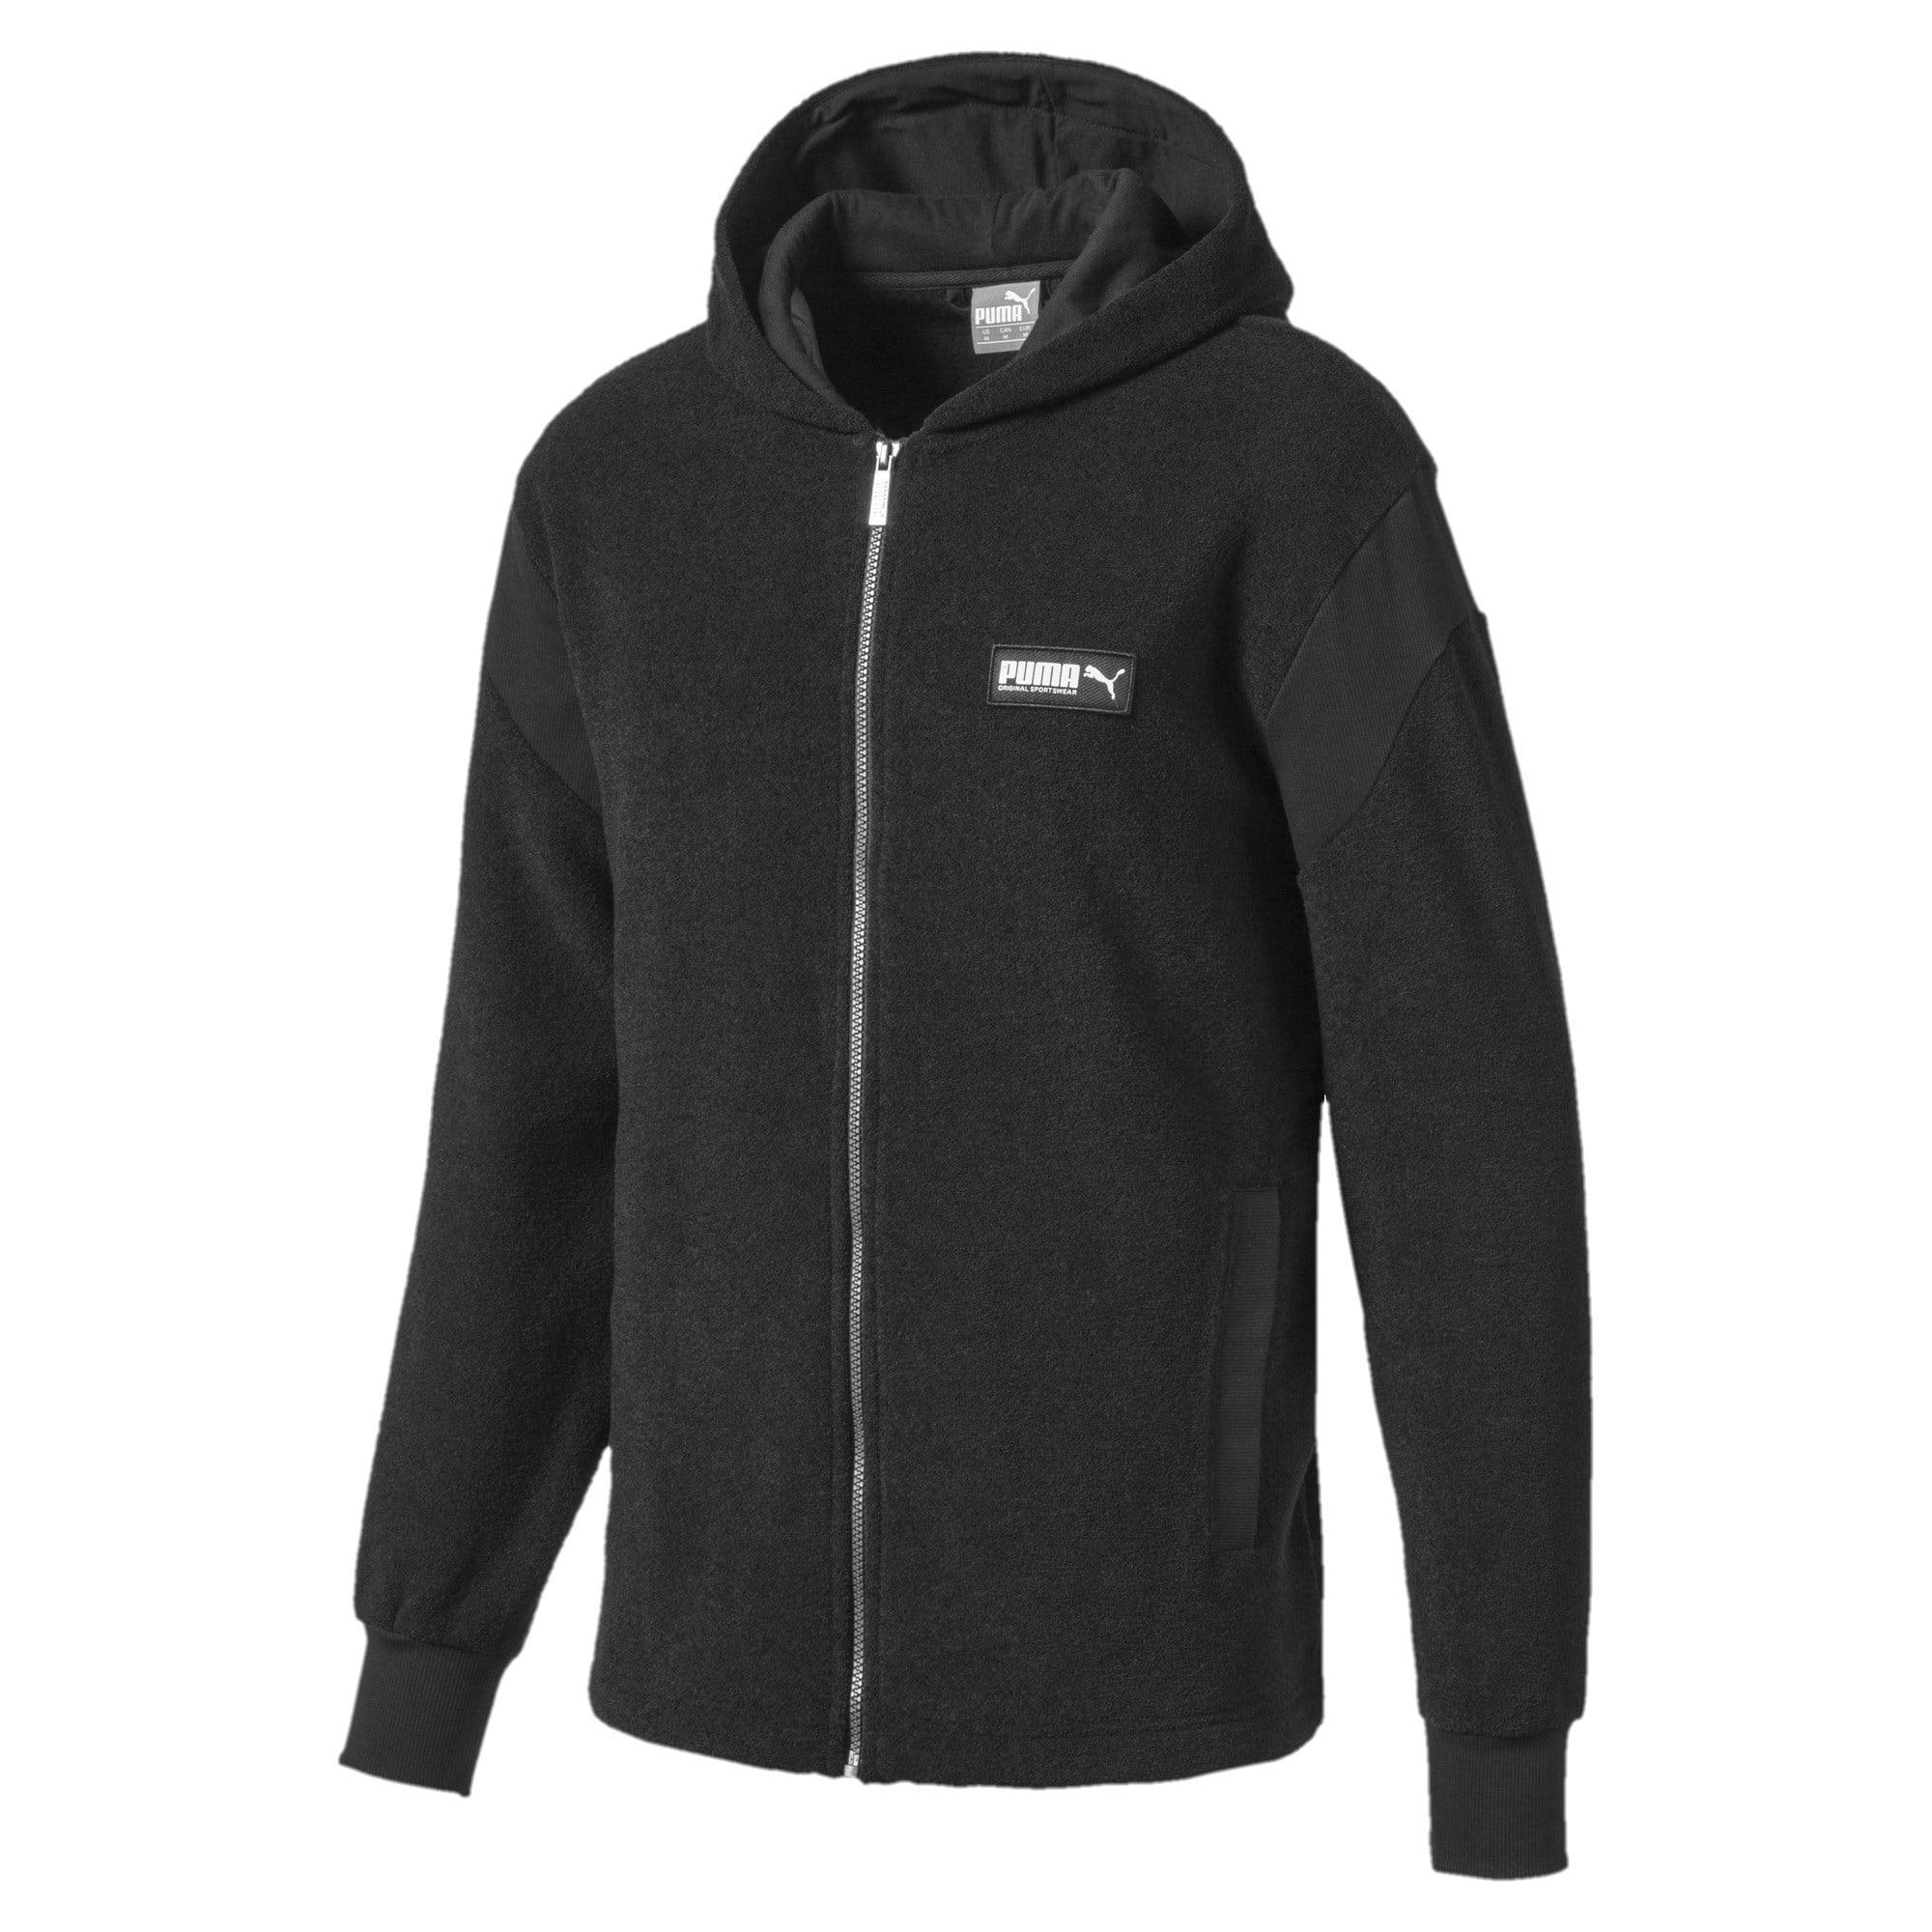 Thumbnail 4 of Fusion Fleece Hooded Men's Sweat Jacket, Puma Black, medium-IND